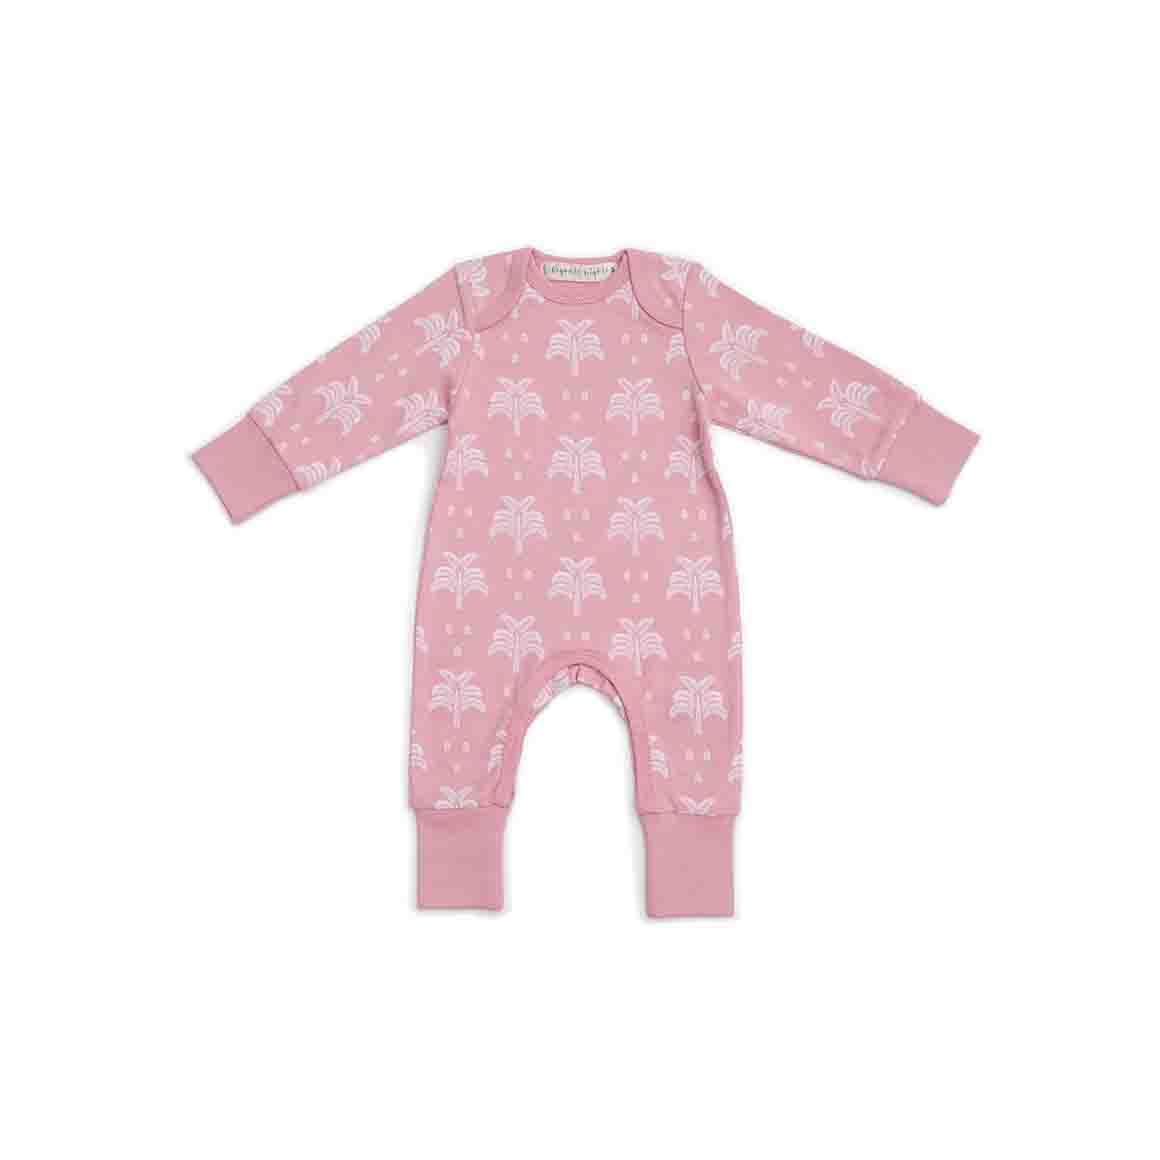 Baby Sleepsuit - Long Arm/Long Leg (Blush Pink In Palms & Pineapples Print)   Trada Marketplace